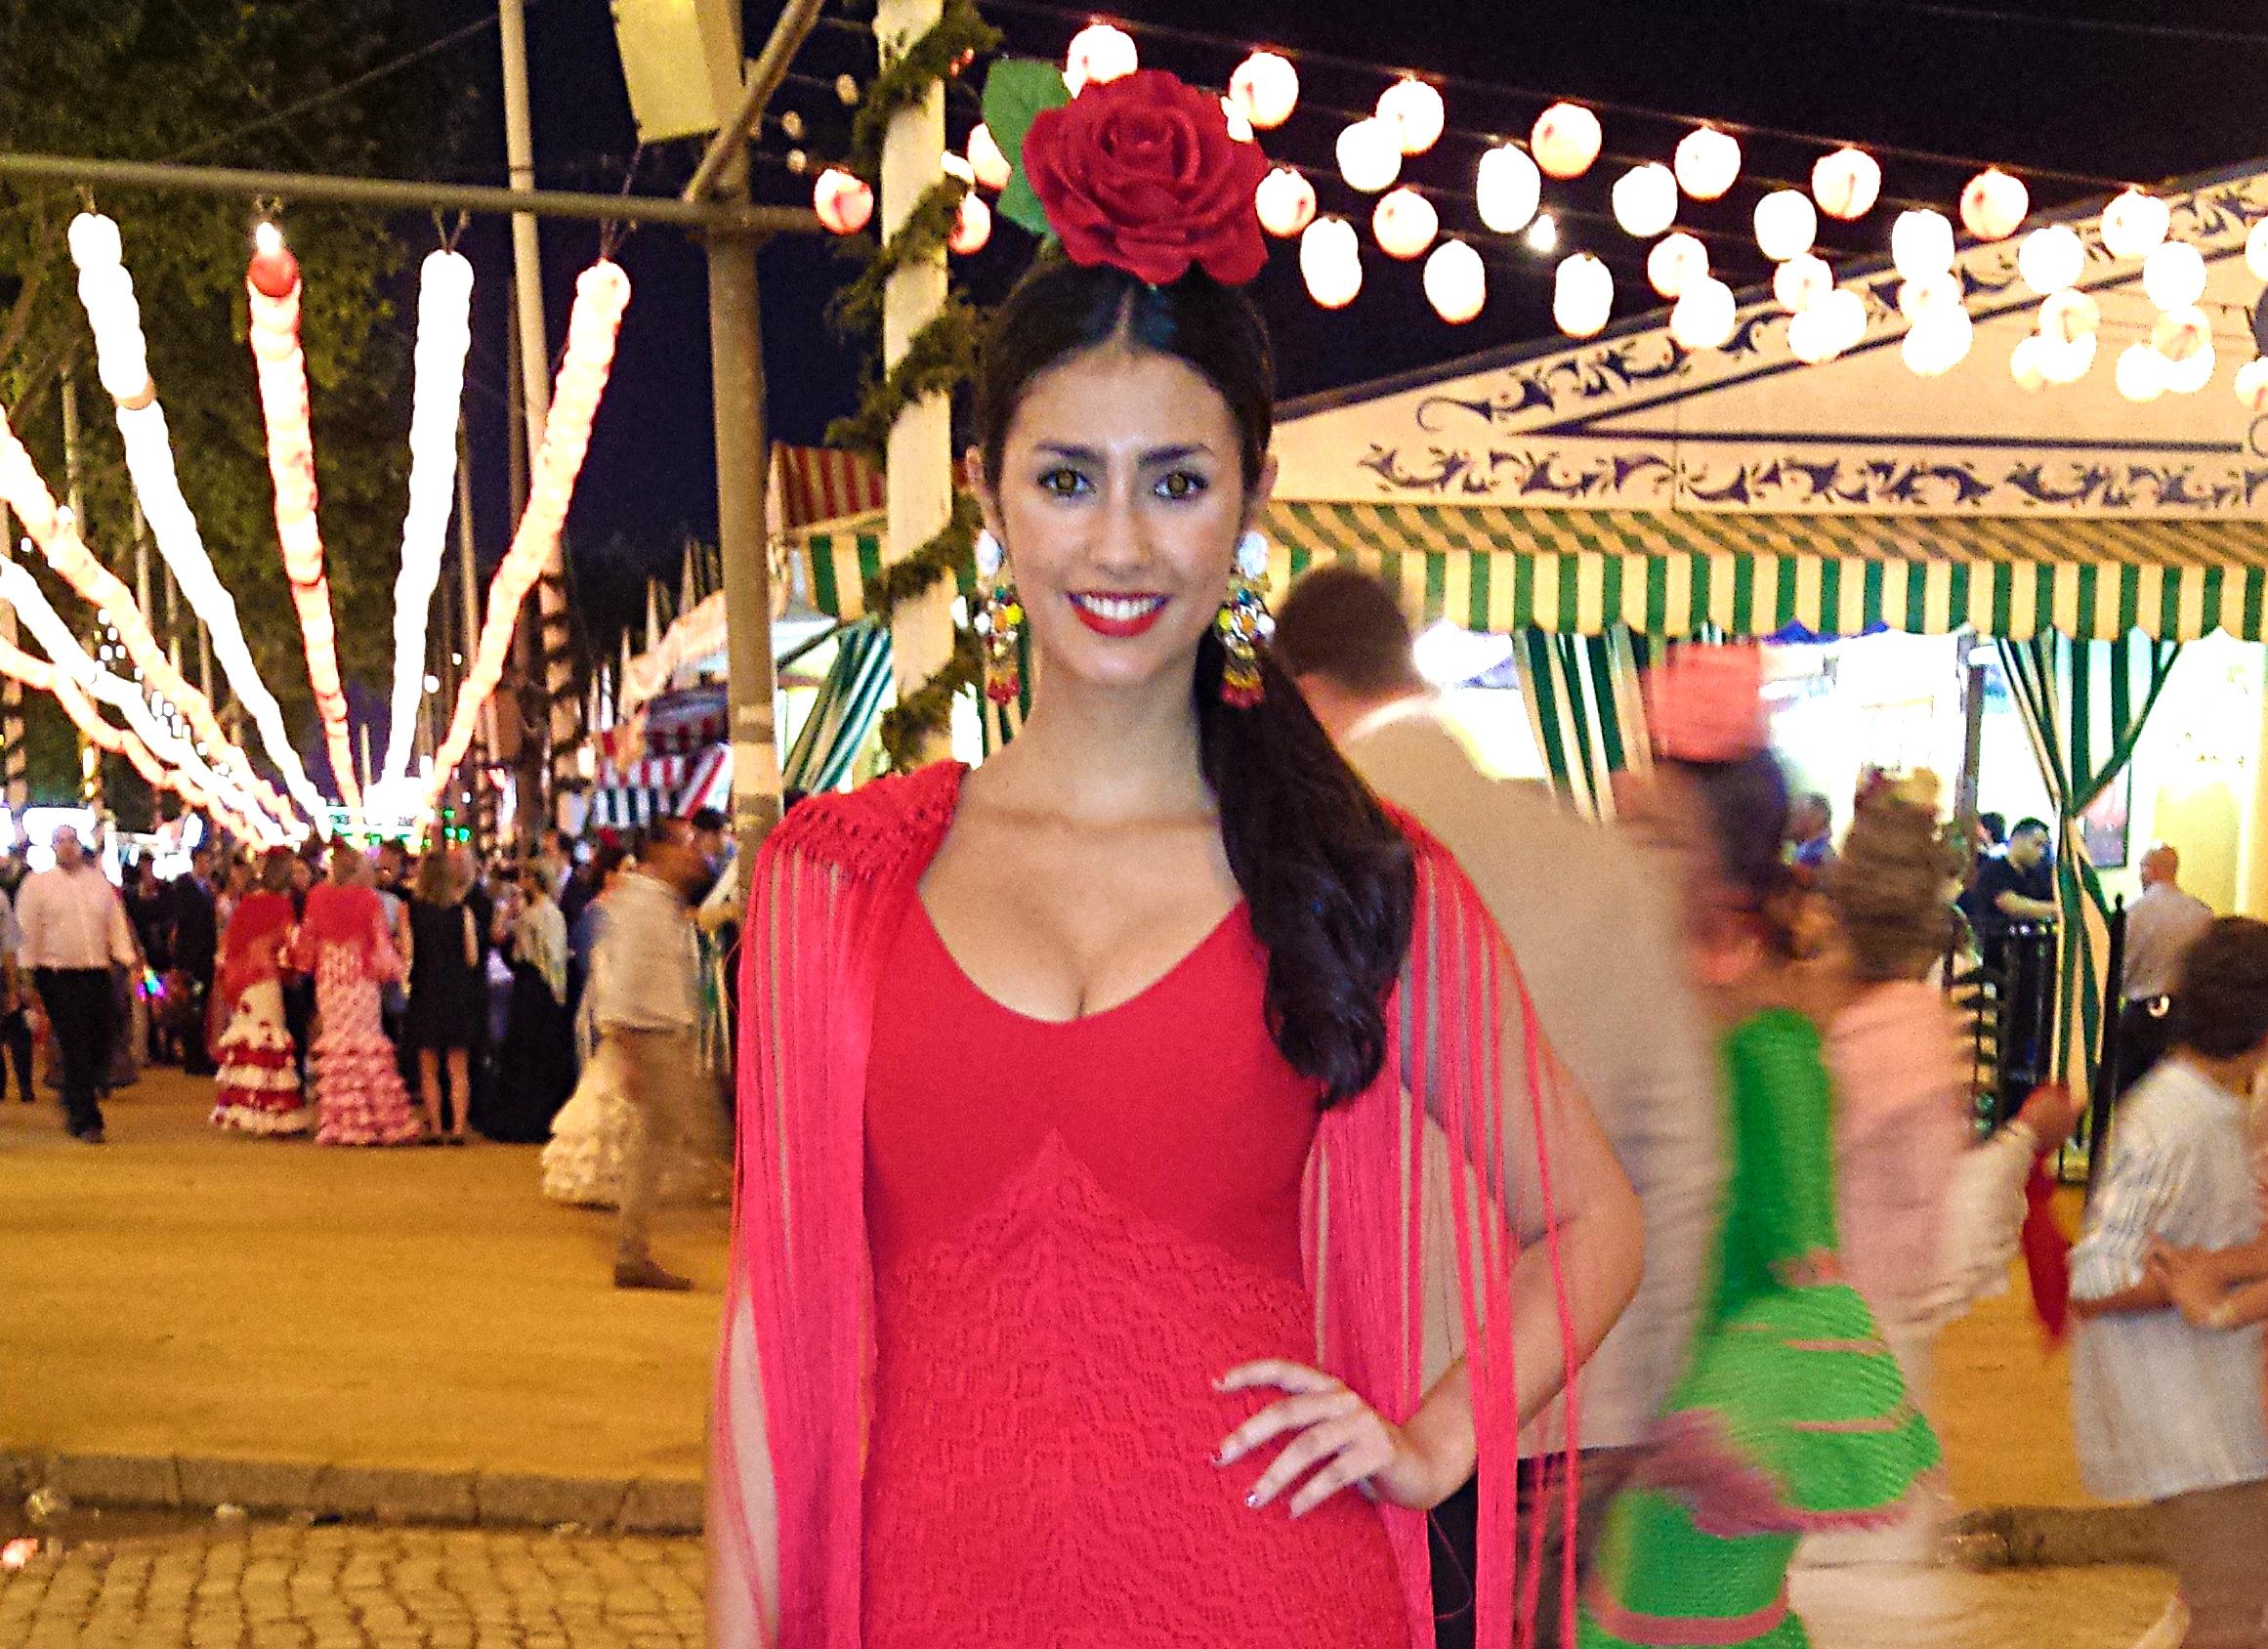 Flamencas en la Feria de Sevilla 2014